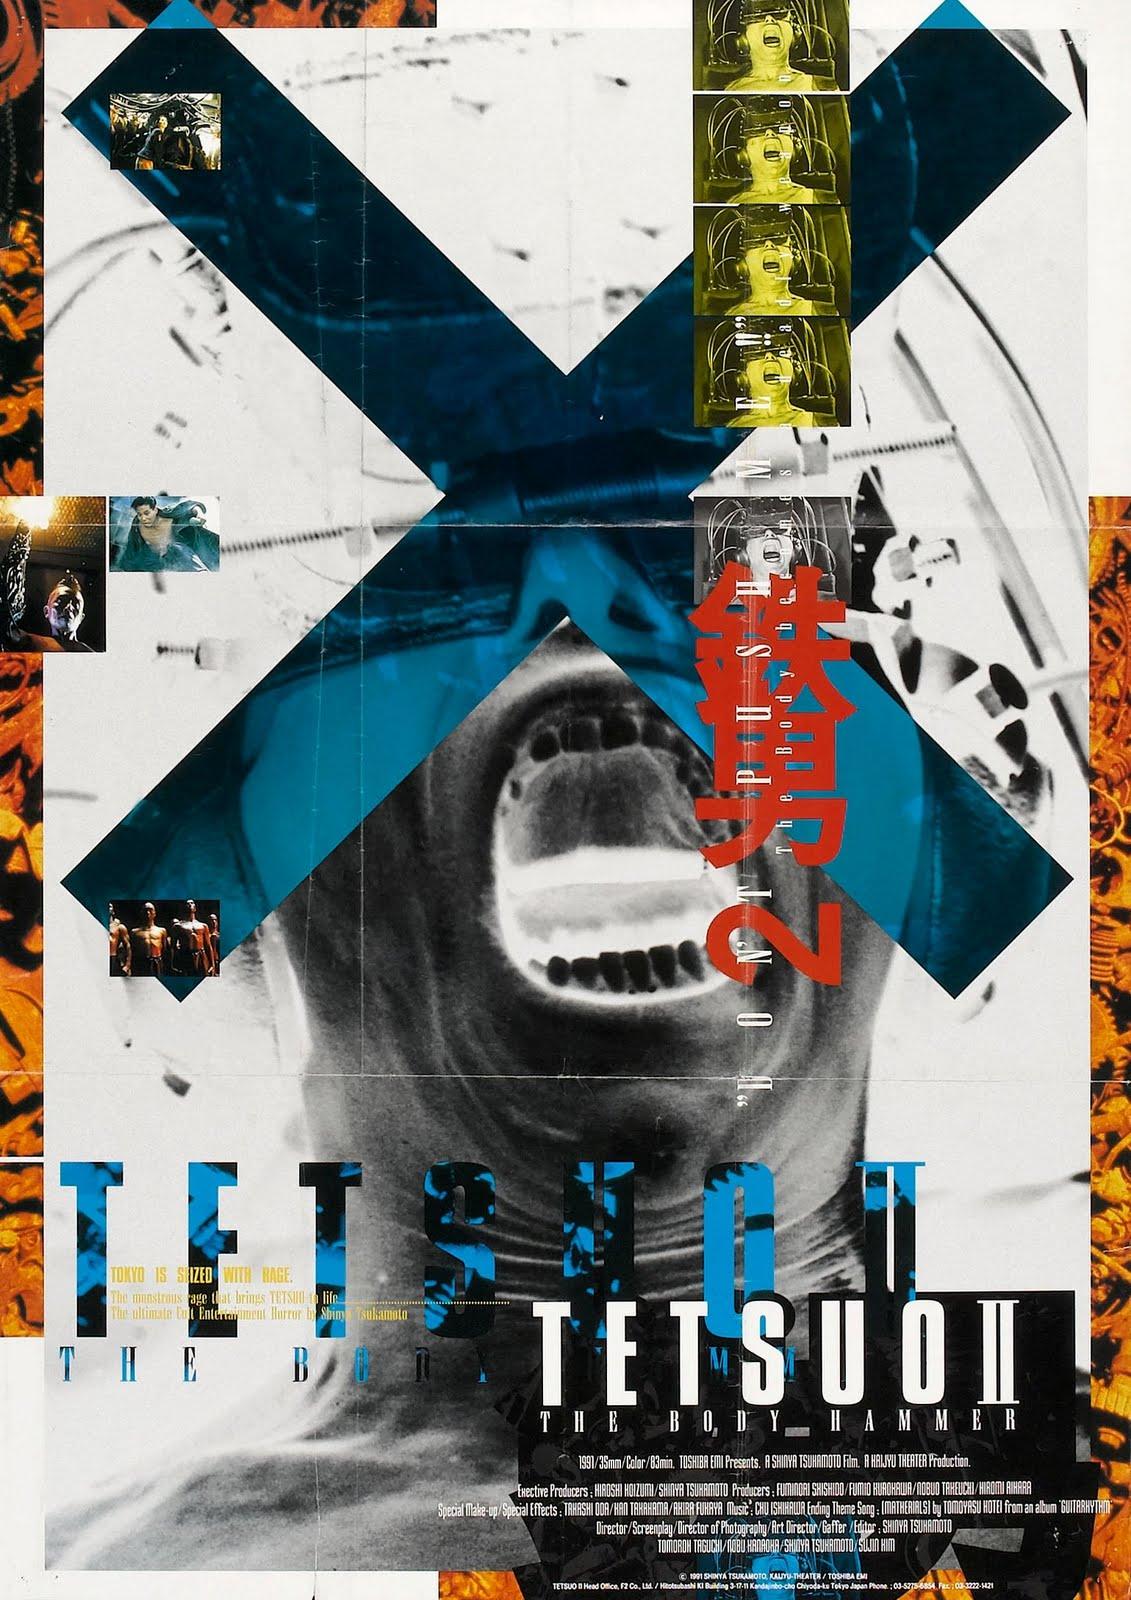 http://1.bp.blogspot.com/_gsUALeZML10/TJkMT_XOMqI/AAAAAAAAJwU/FKOdgShHBHY/s1600/tetsuo_2_poster_01.jpg